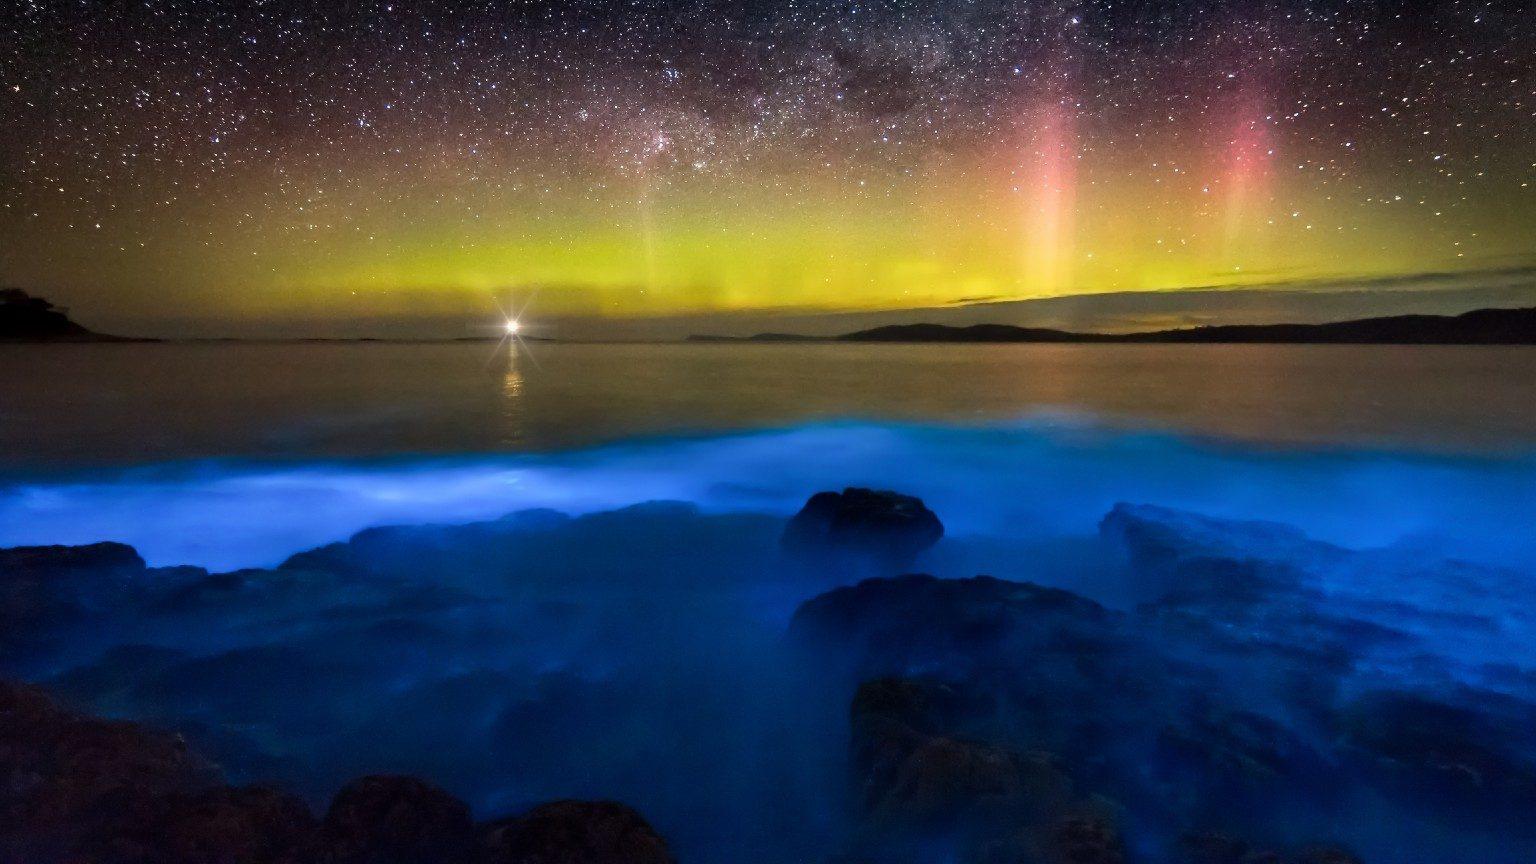 Bioluminescence in Tasmania with Aurora Borelis.